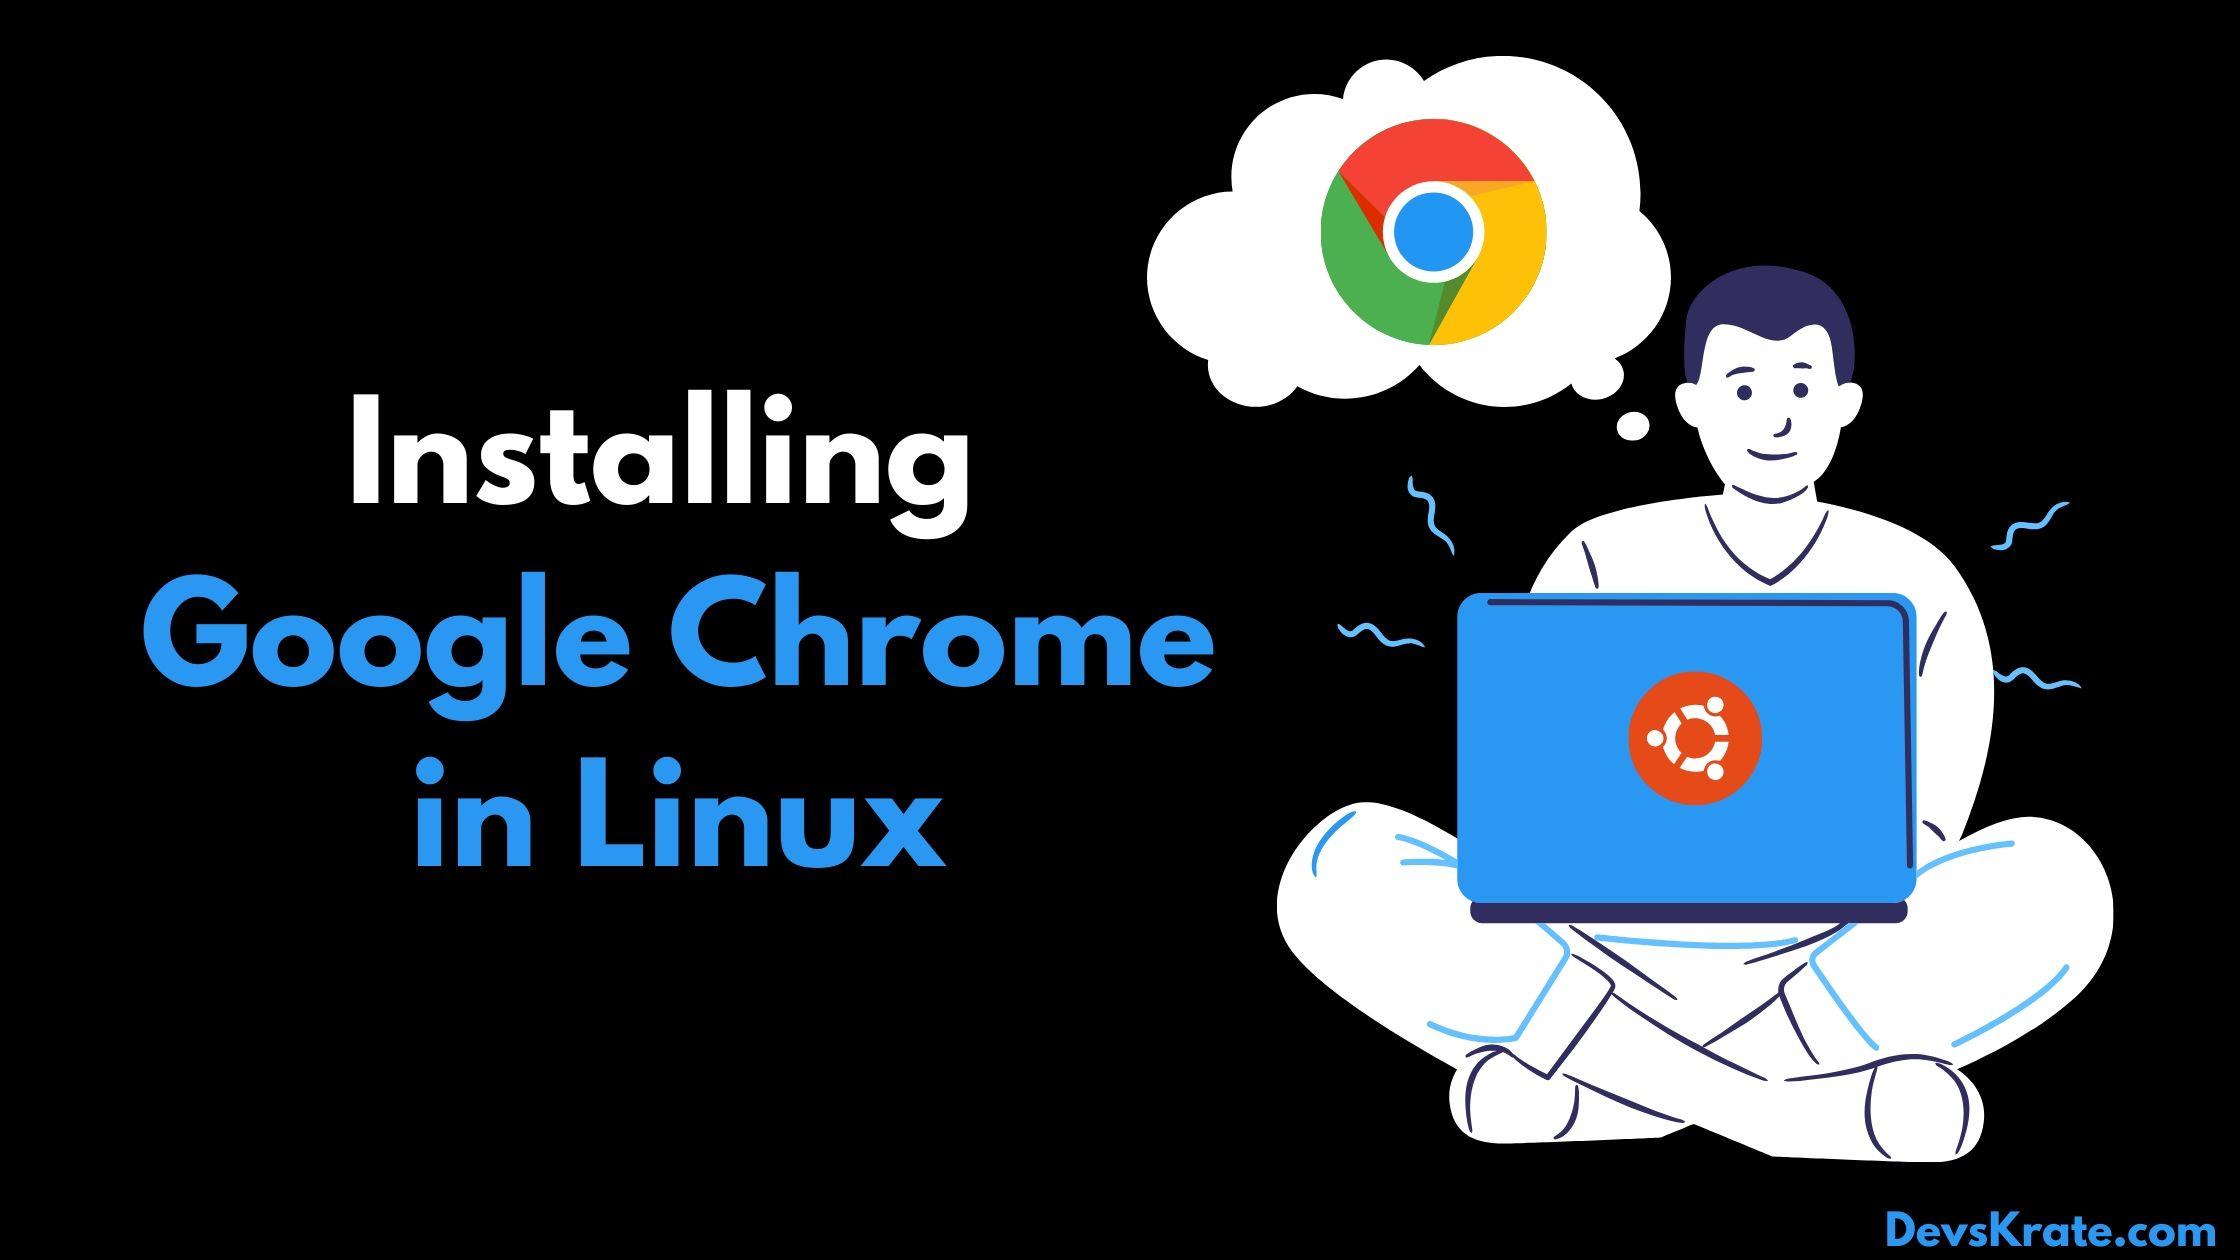 Install Google Chrome in Ubuntu/Linux